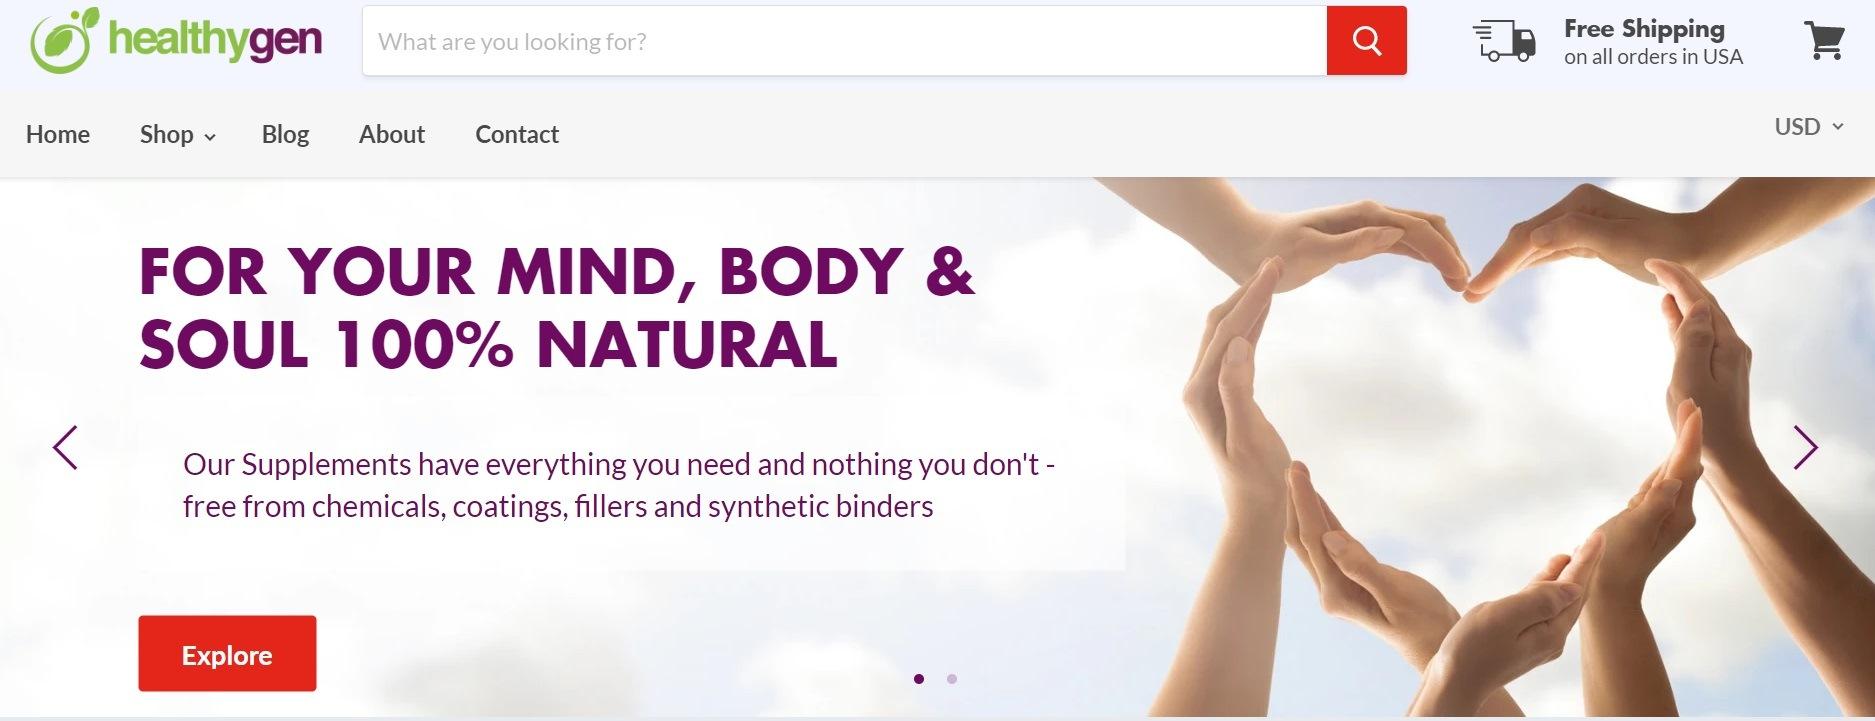 Healthygen Affiliate Program